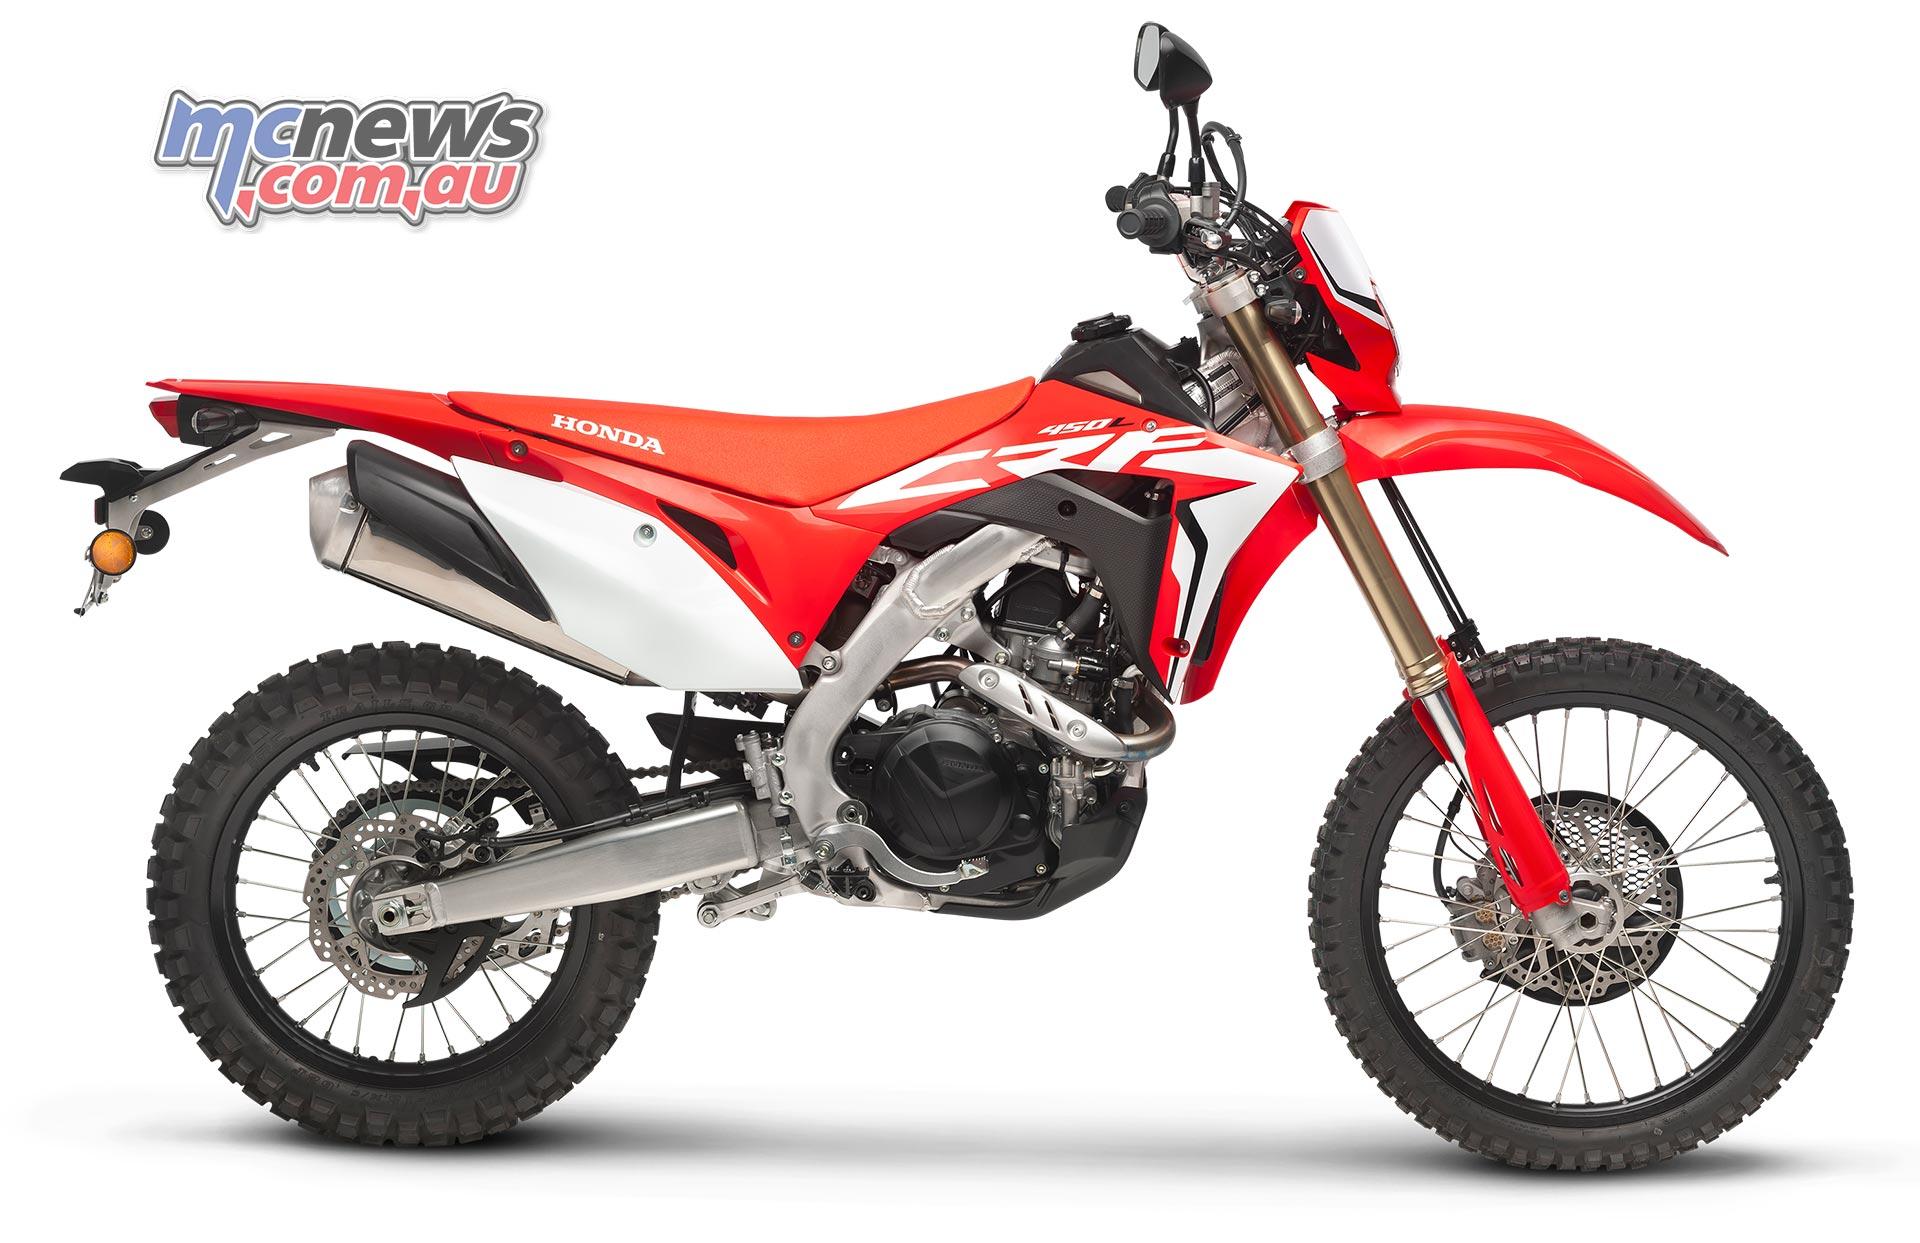 Honda Crf450r Based Road Legal Enduro Bike On Way Mcnewscomau